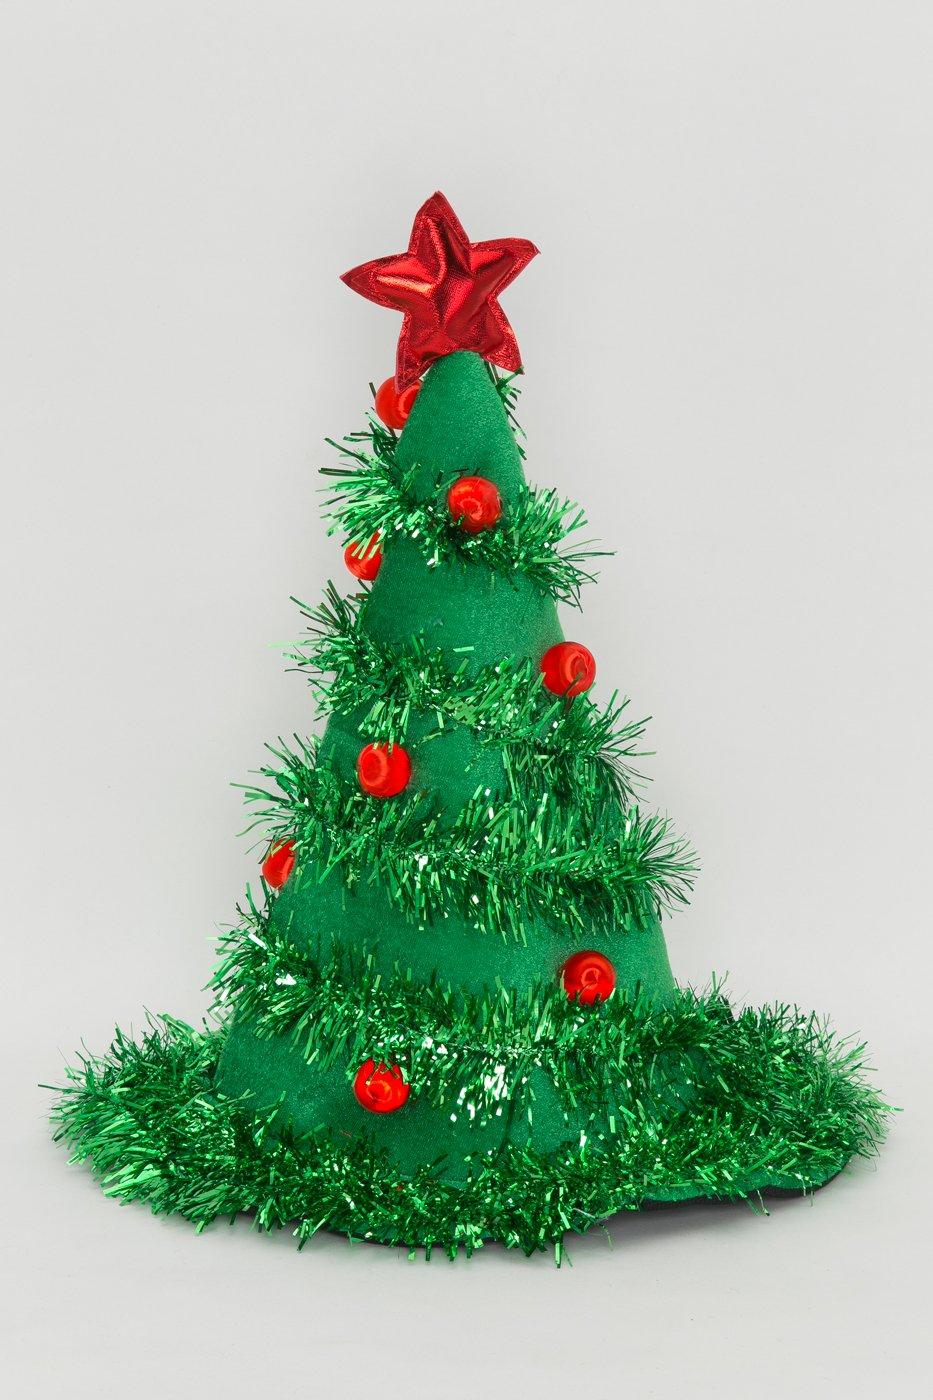 Amazon.com: Jacobson Hat Company Adult Light-Up Christmas Tree Hat ...